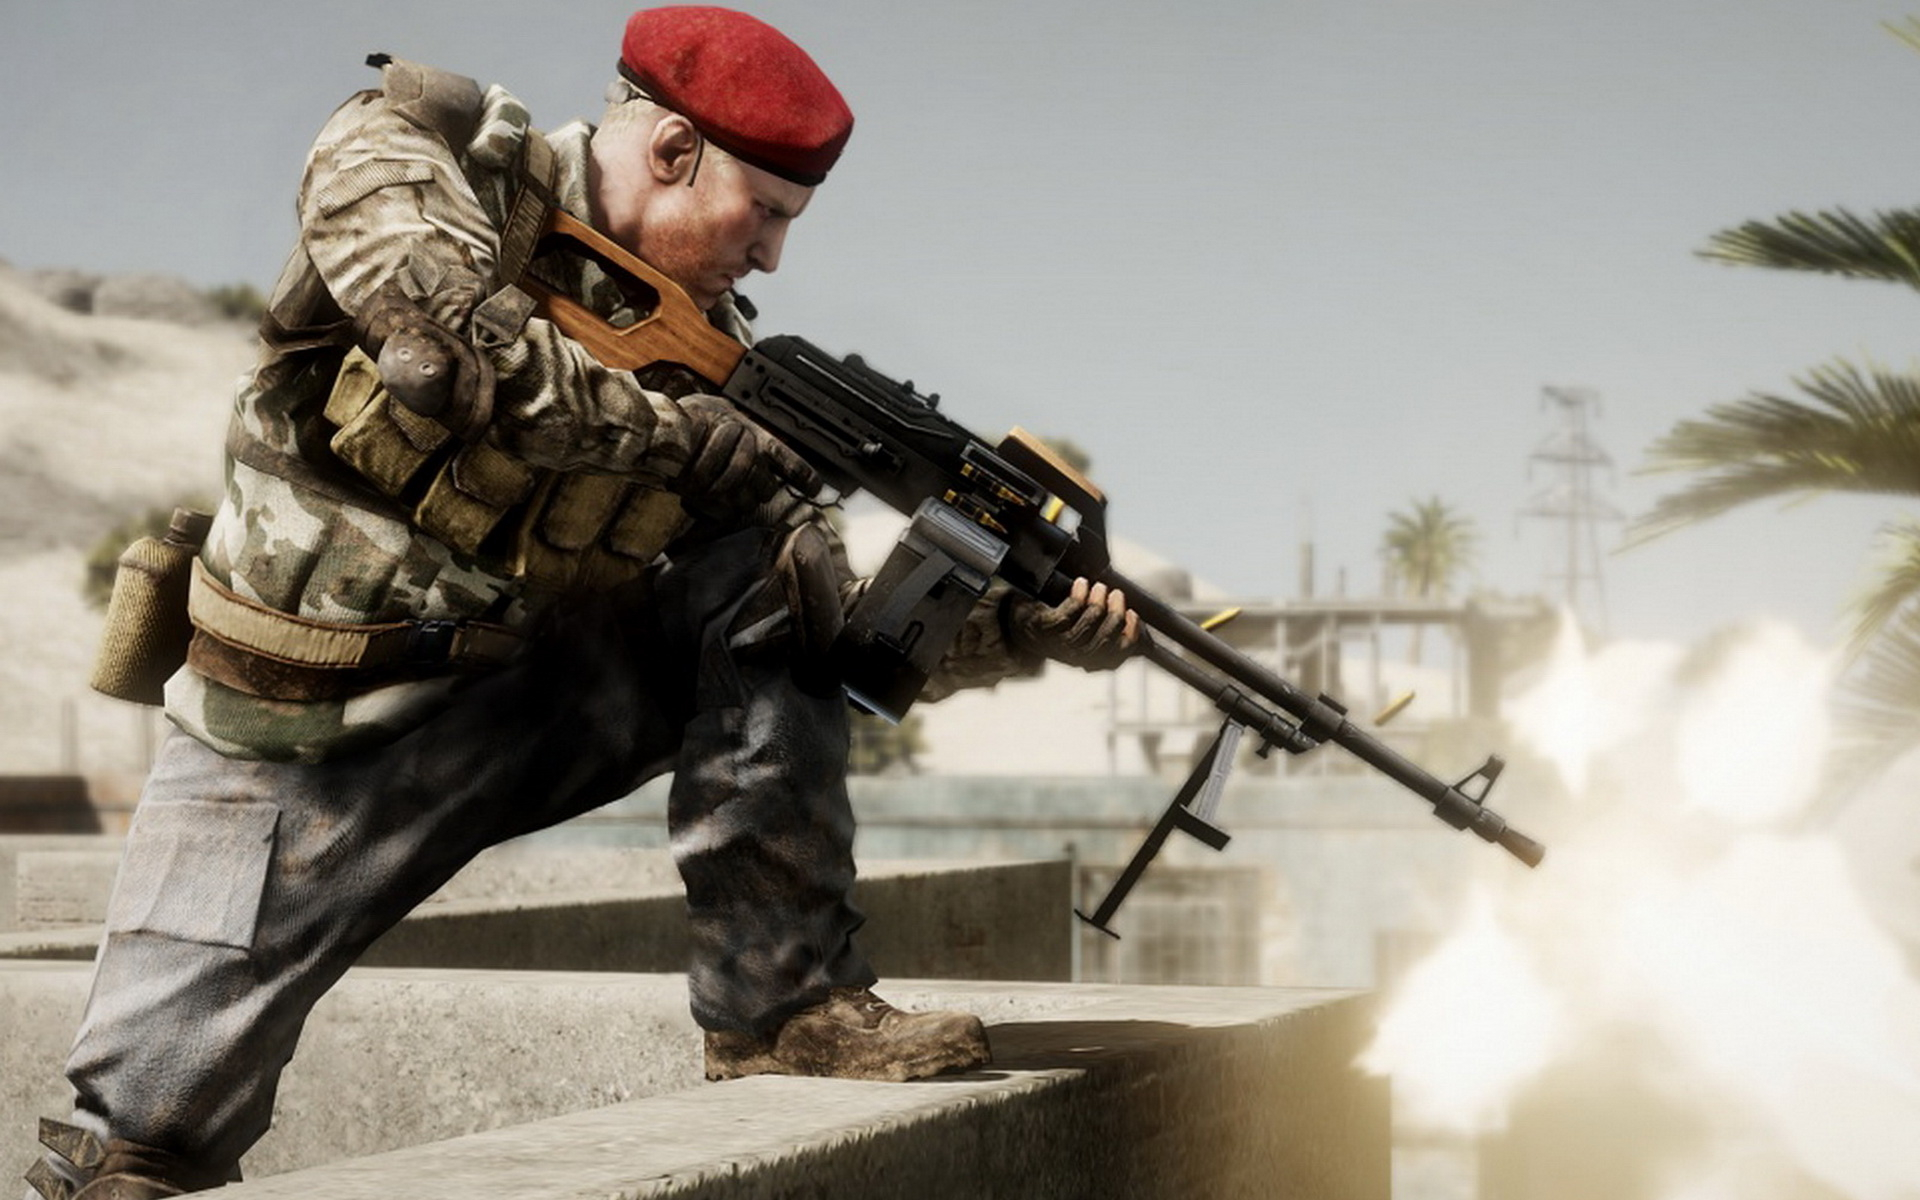 Games_Battlefield_Bad_Company_022191_.jpg - -